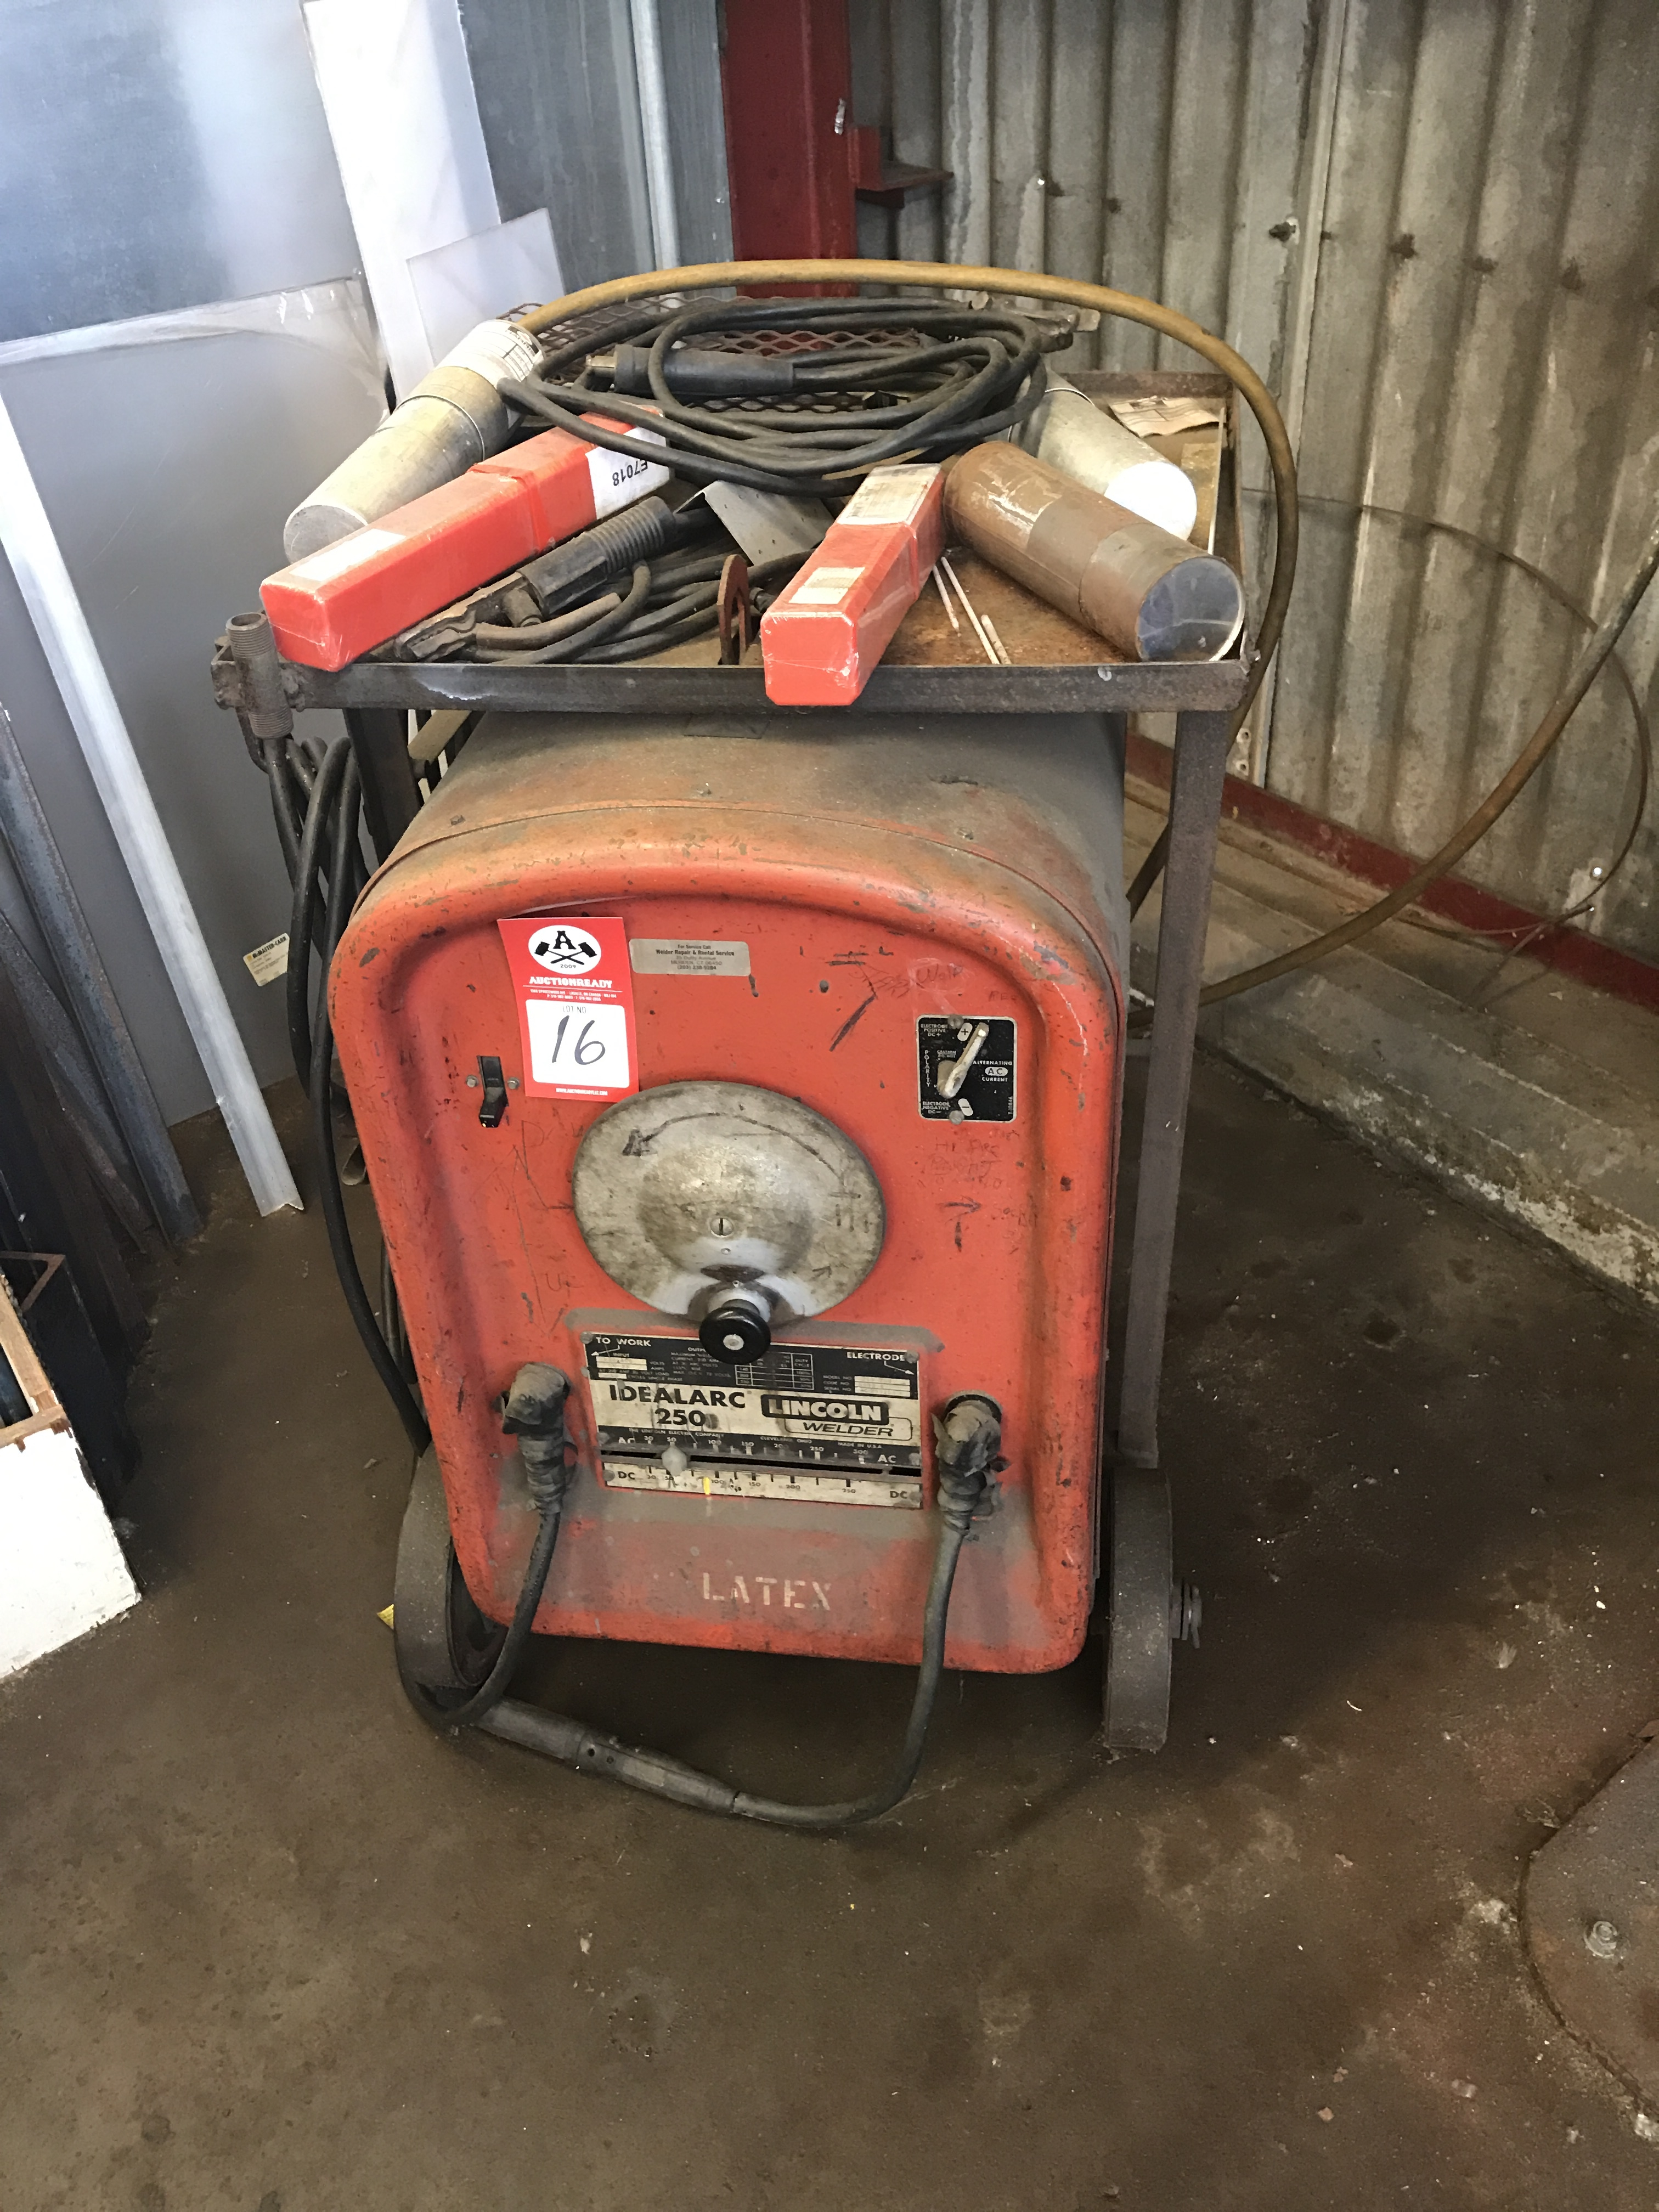 Lot 16 - Welder, Lincoln Idealarc 250 stick welder